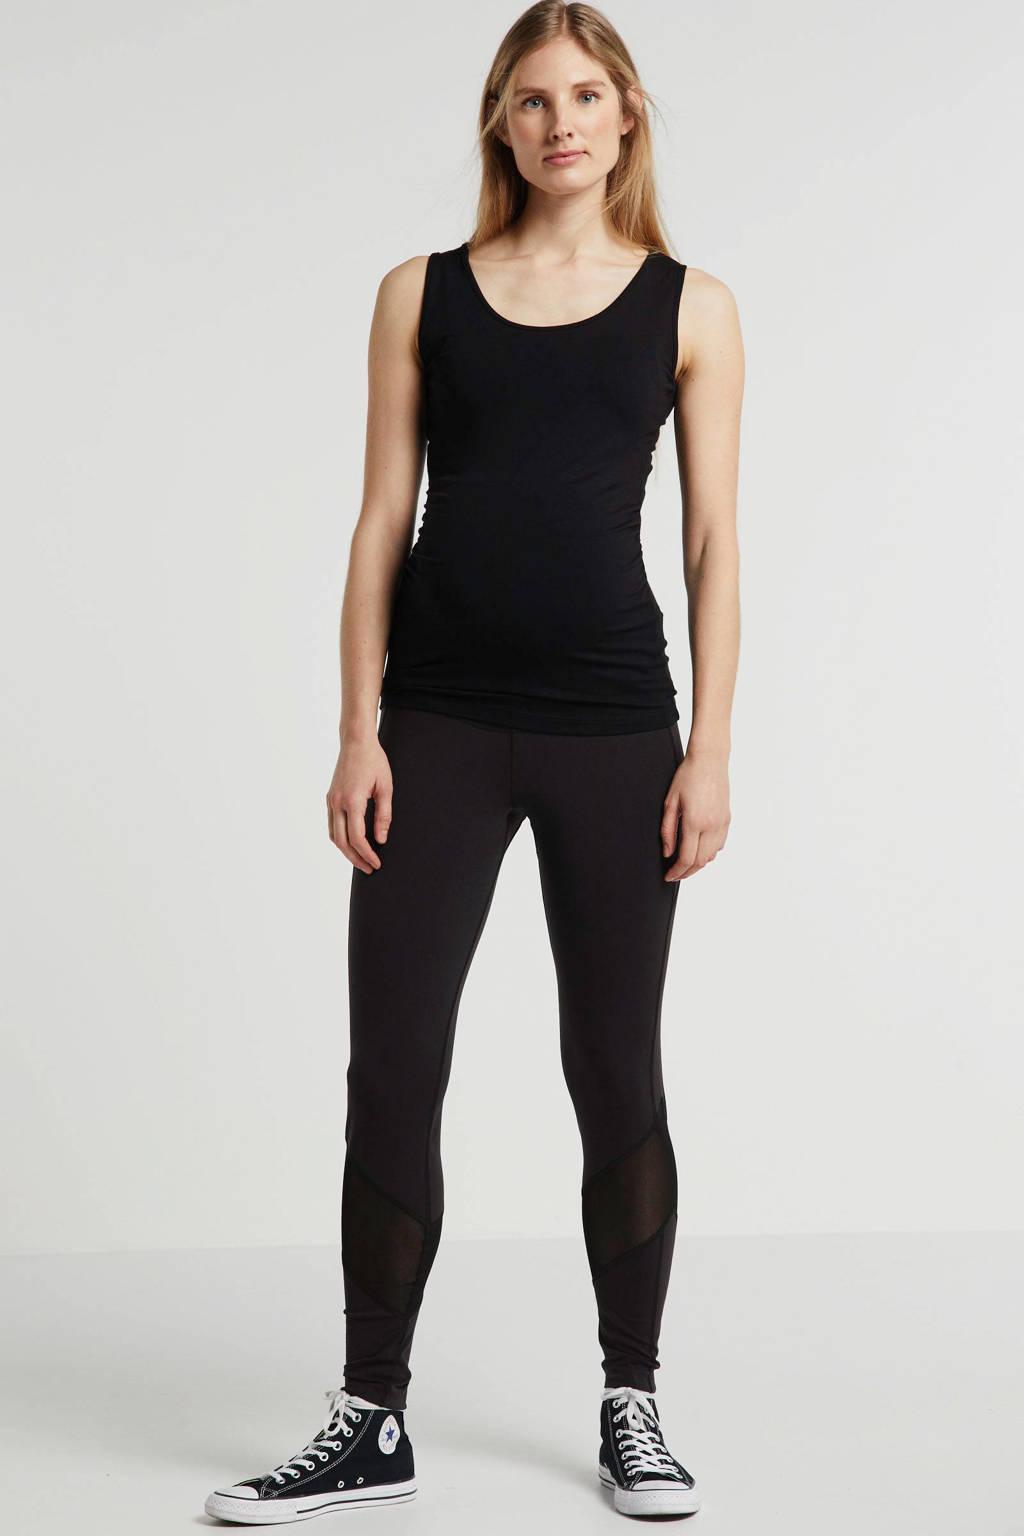 LOVE2WAIT zwangerschaps sportlegging met mesh zwart, Zwart